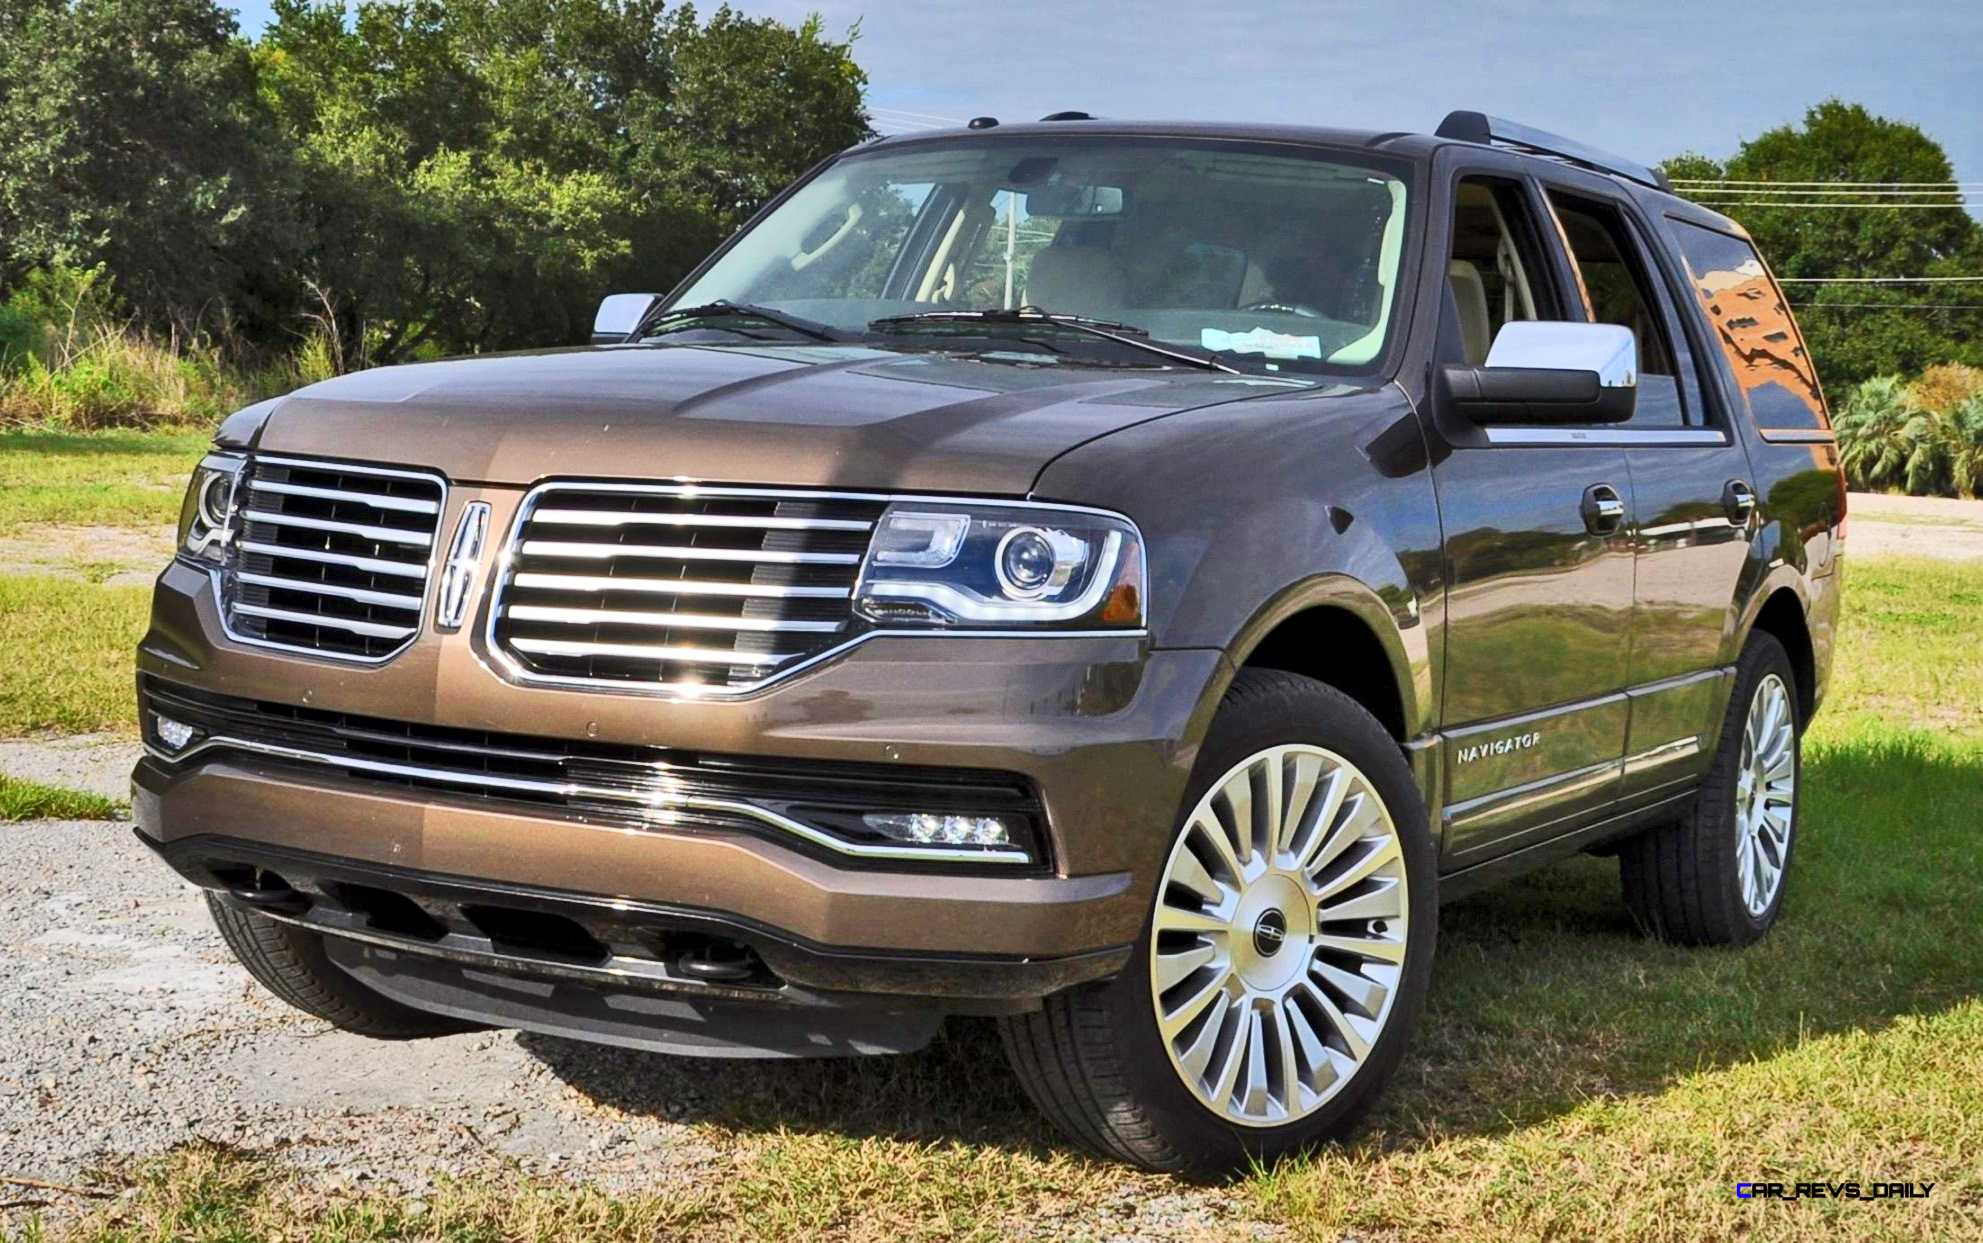 hd road test review 2015 lincoln navigator 4 4 reserve best full size suv car revs. Black Bedroom Furniture Sets. Home Design Ideas